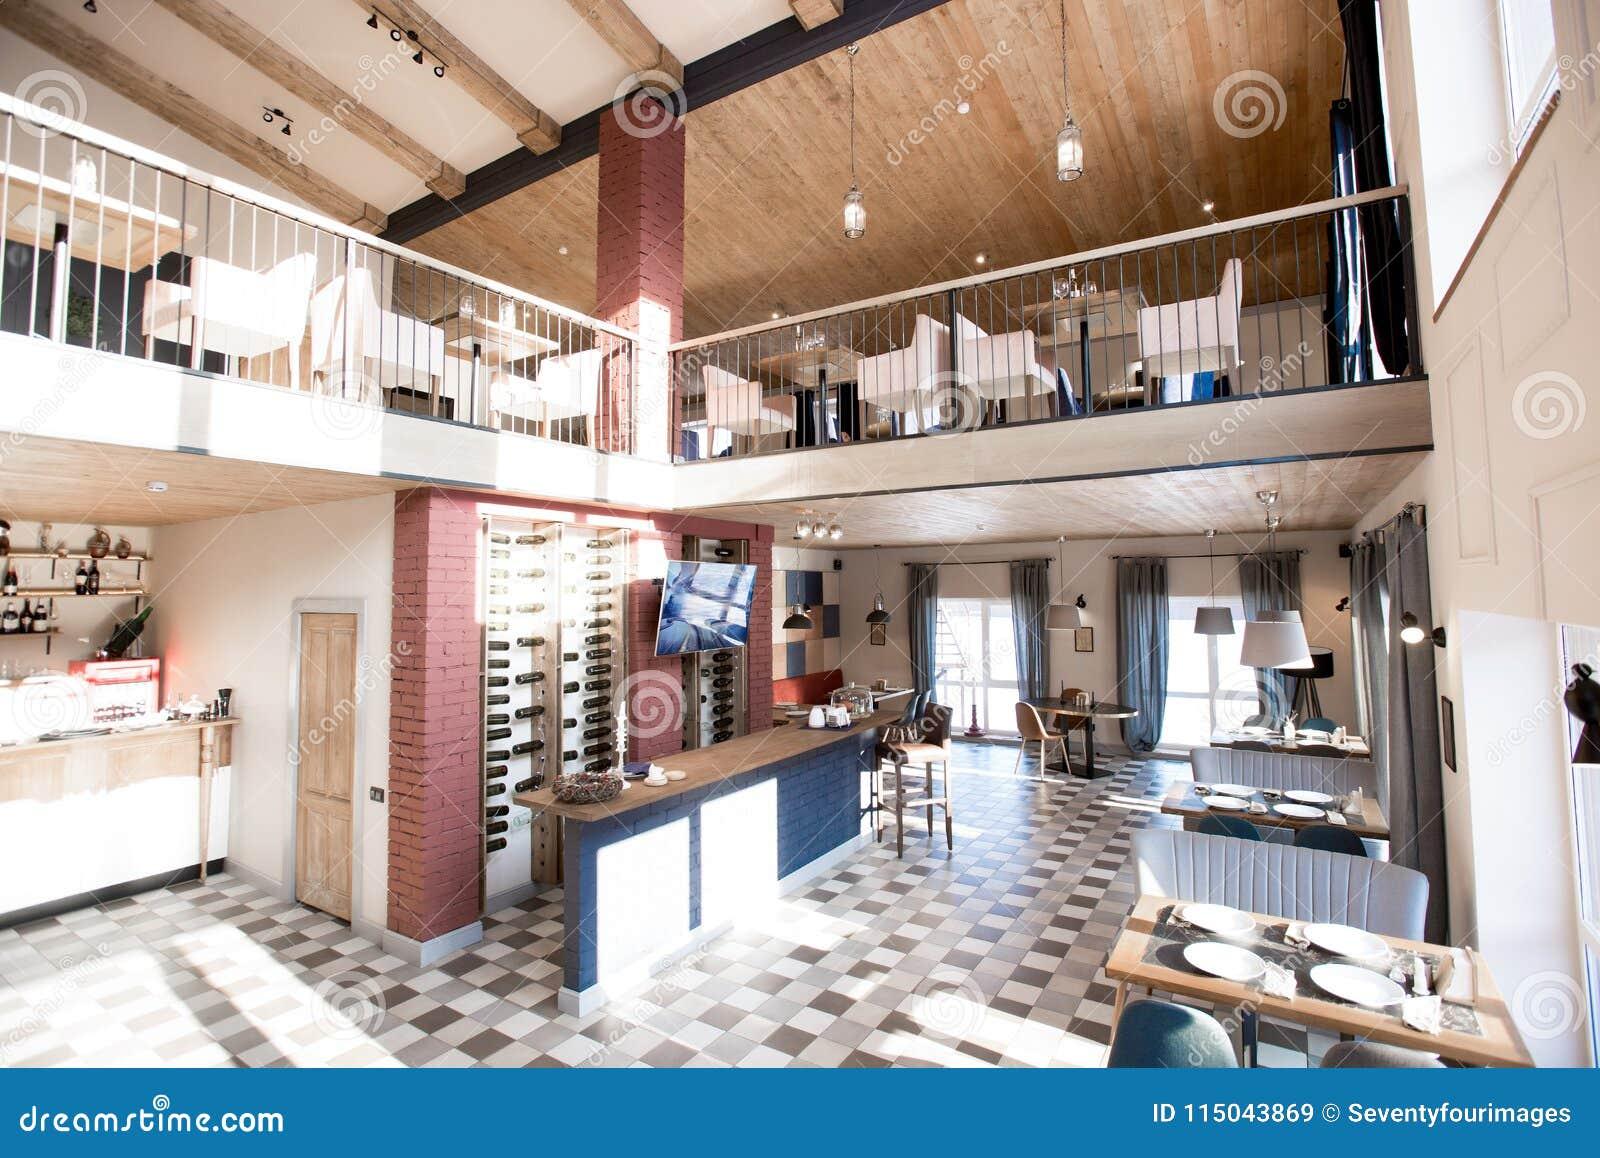 Cozy Restaurant With Fashionable Interior Design Stock Image Image Of Sofa Leisure 115043869